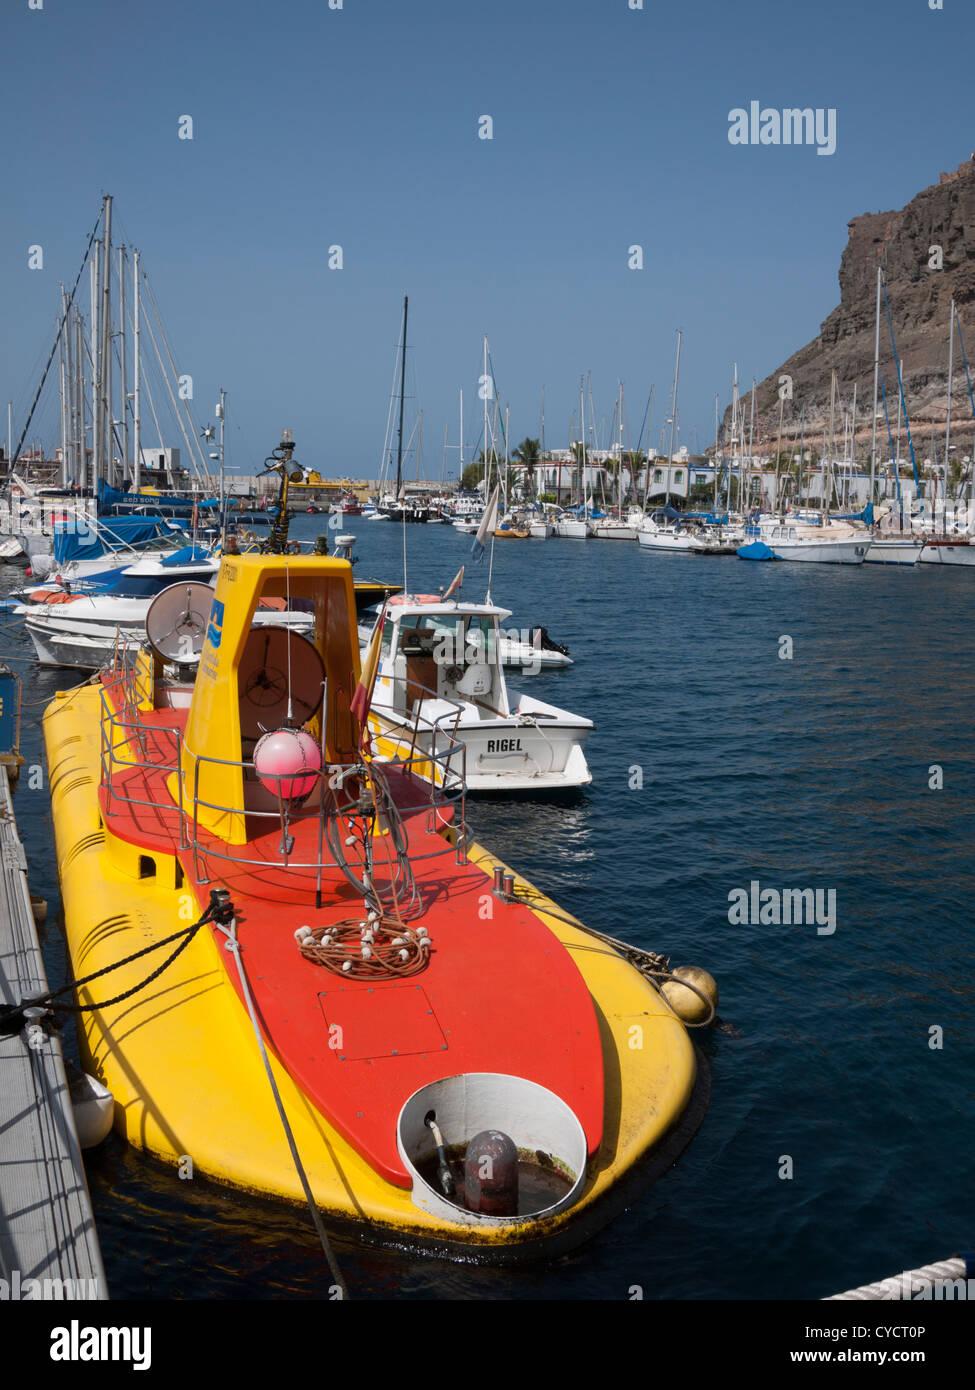 Das U Boot gelben u-Boot in Puerto de Mogan Gran Canaria Kanaren Spanien Stockbild